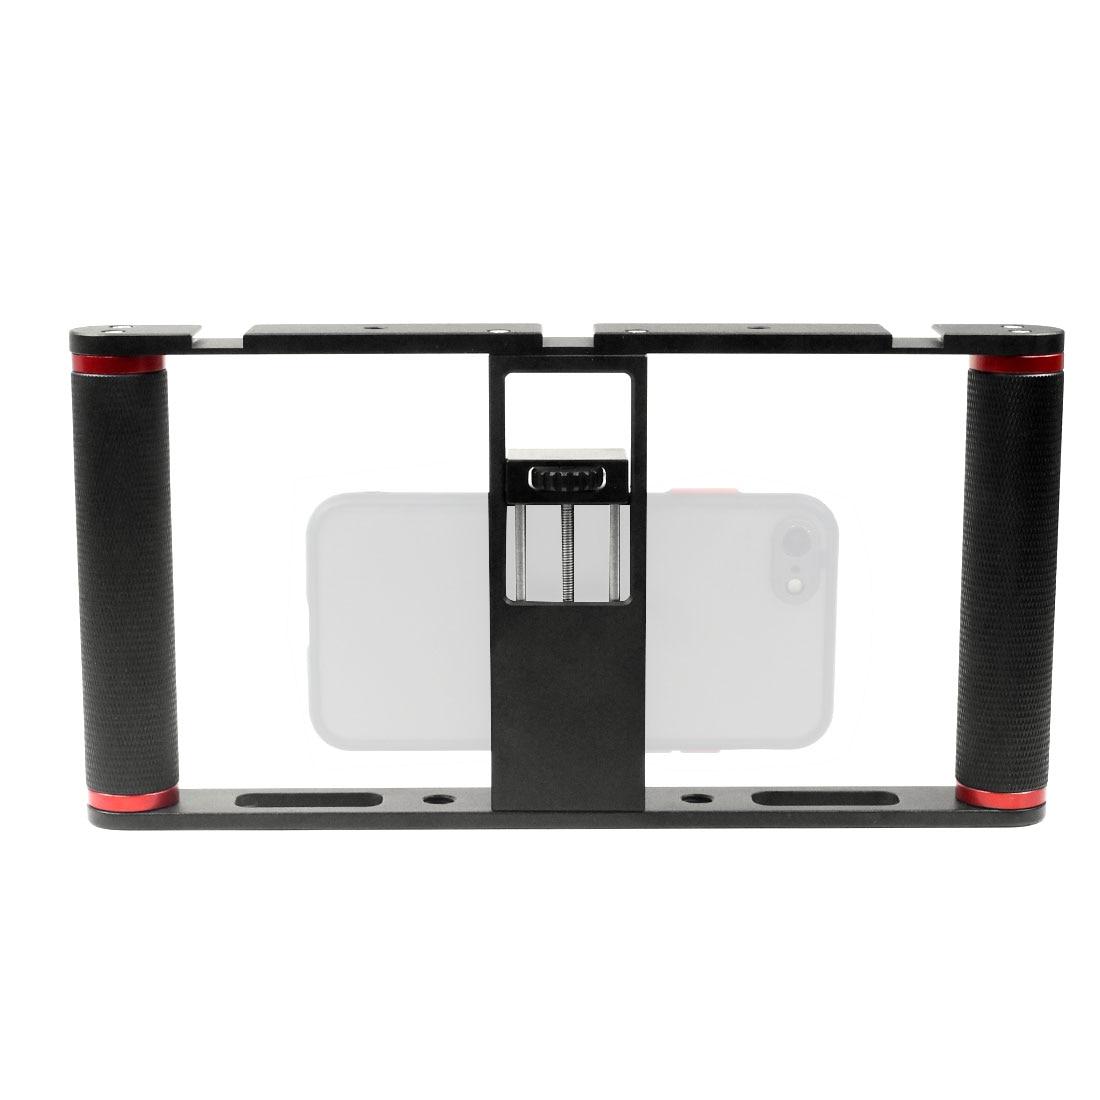 Liga de Alumínio Equipamento de Vídeo Montagens de Sapato Suporte de Montagem U-rig Smartphone Filmmaking Case Handheld Telefone Vídeo Estabilizador Aperto Tripé w 3